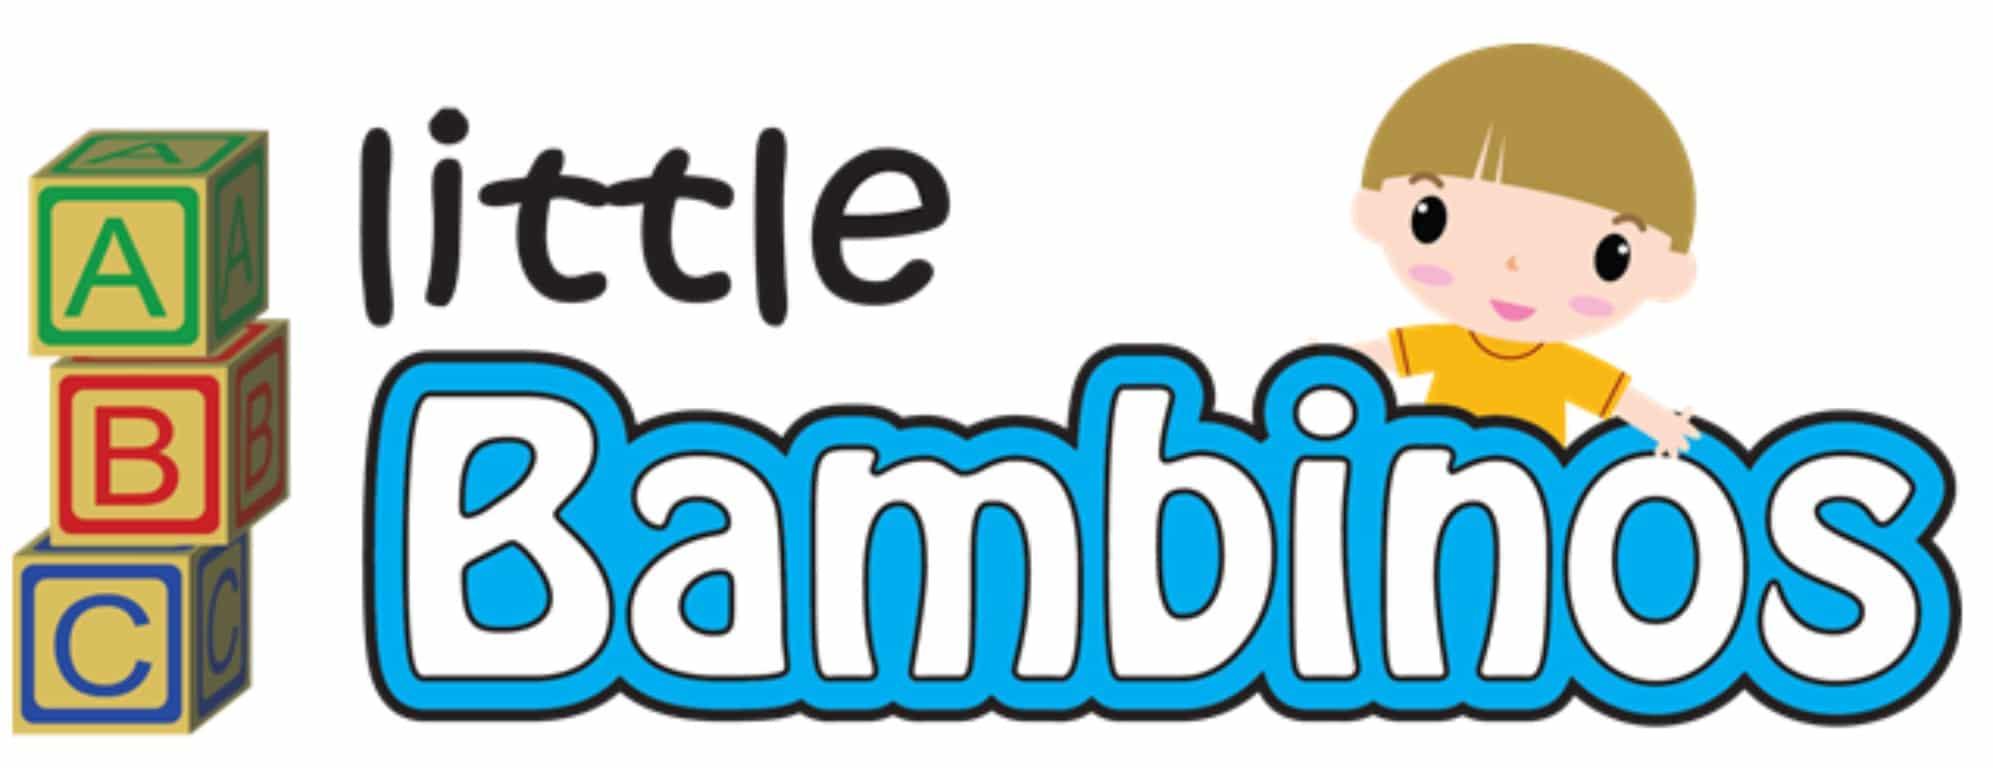 Little Bambinos 3